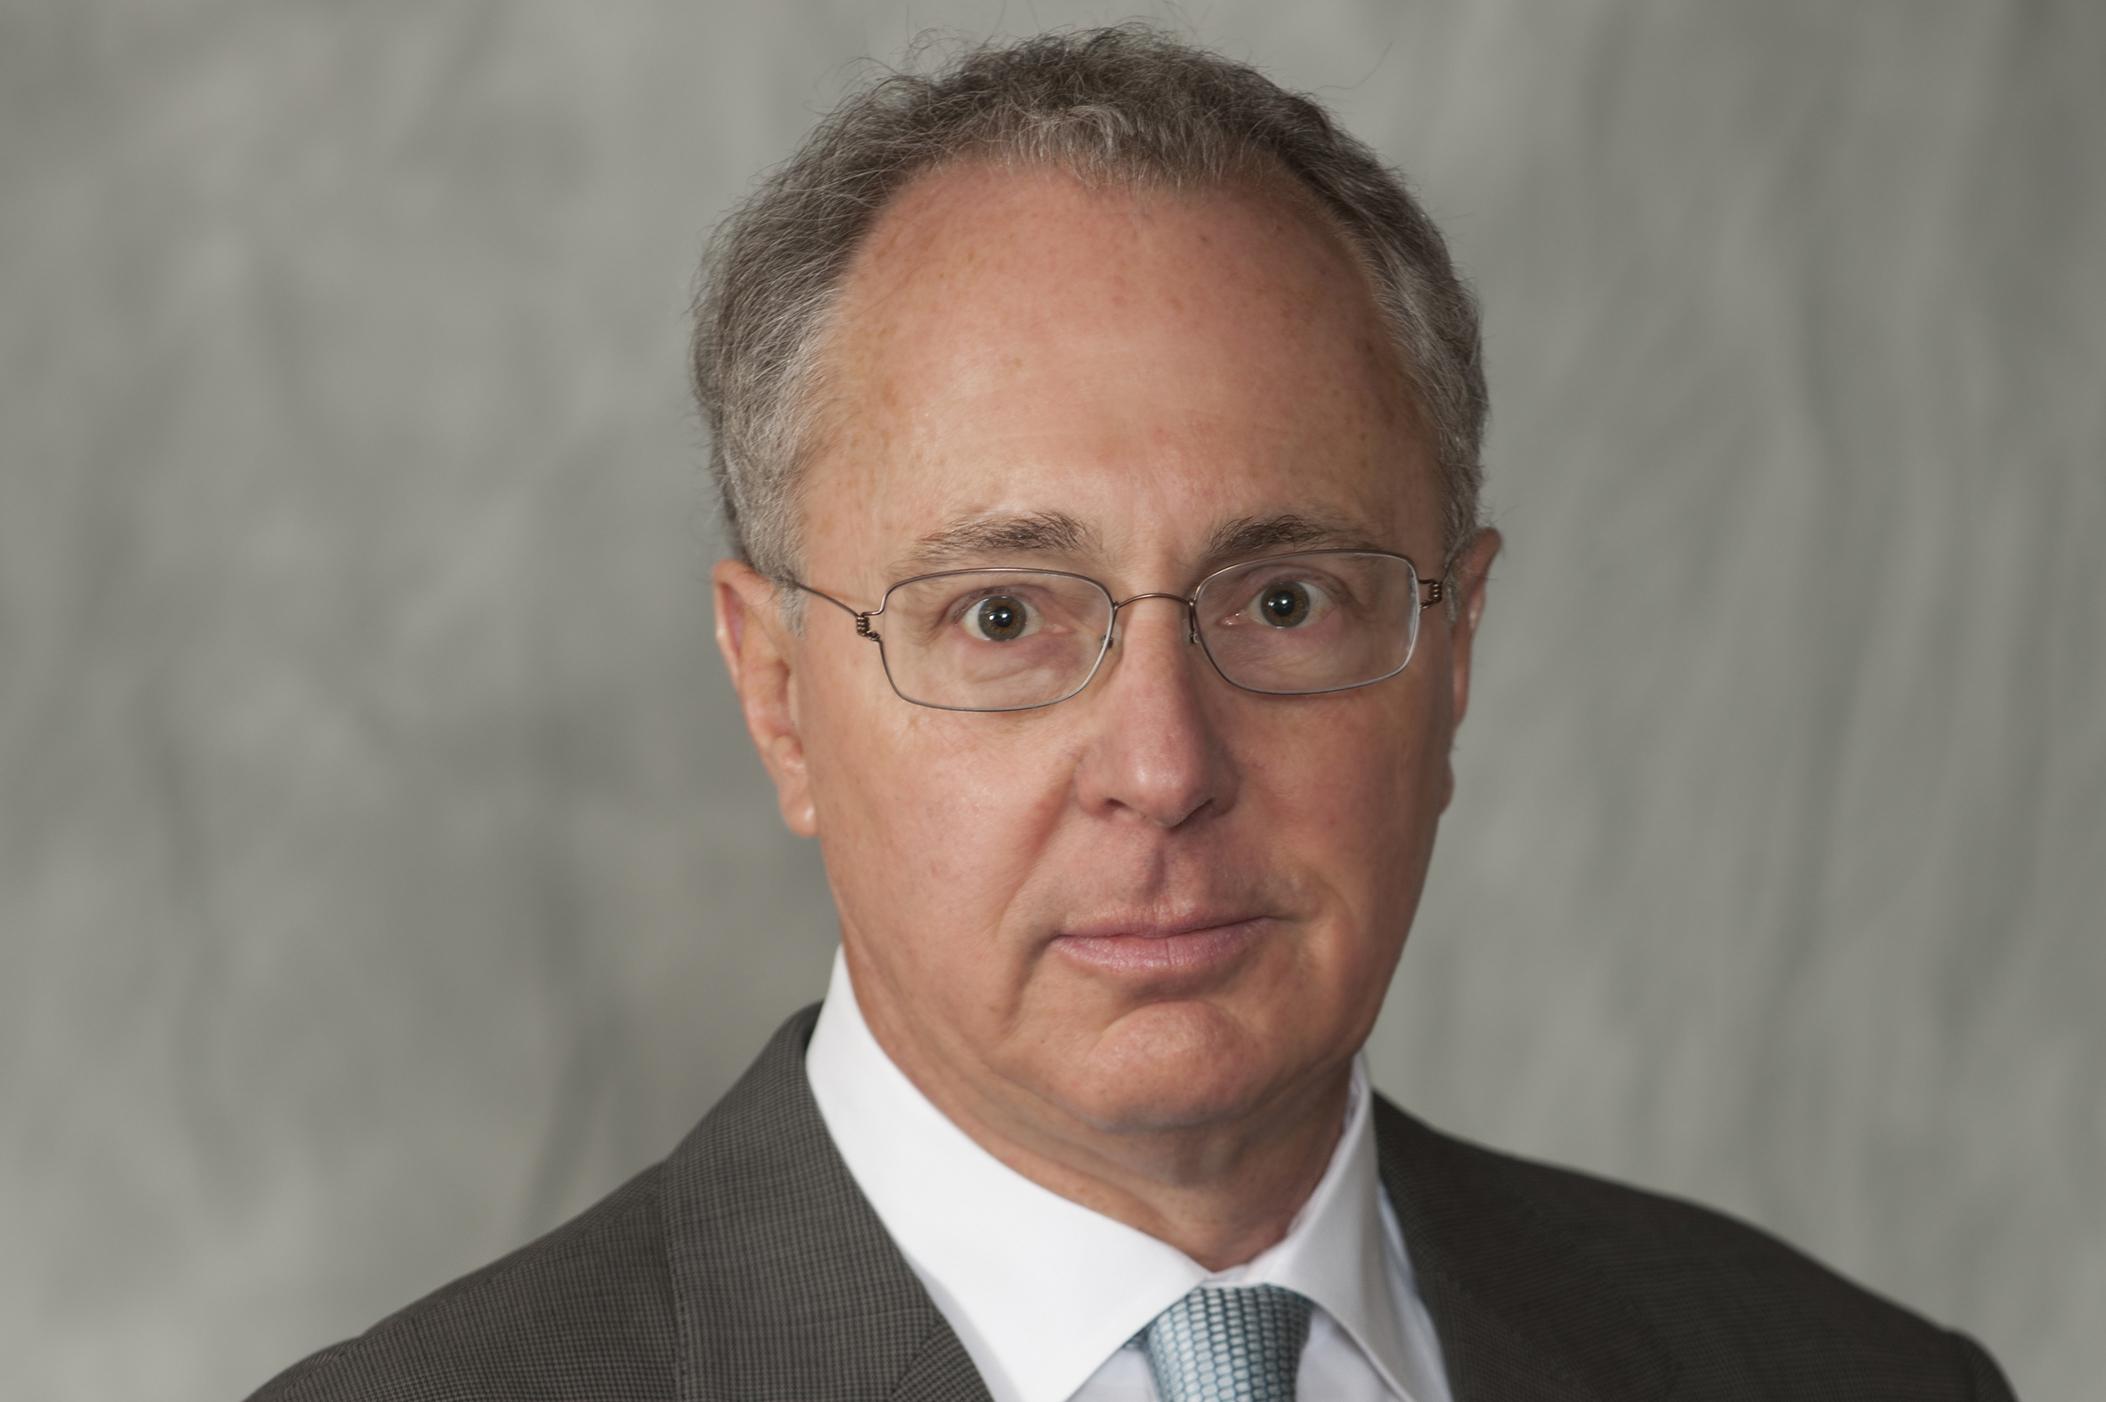 Photo of Roger M. Perlmutter, M.D., Ph.D.